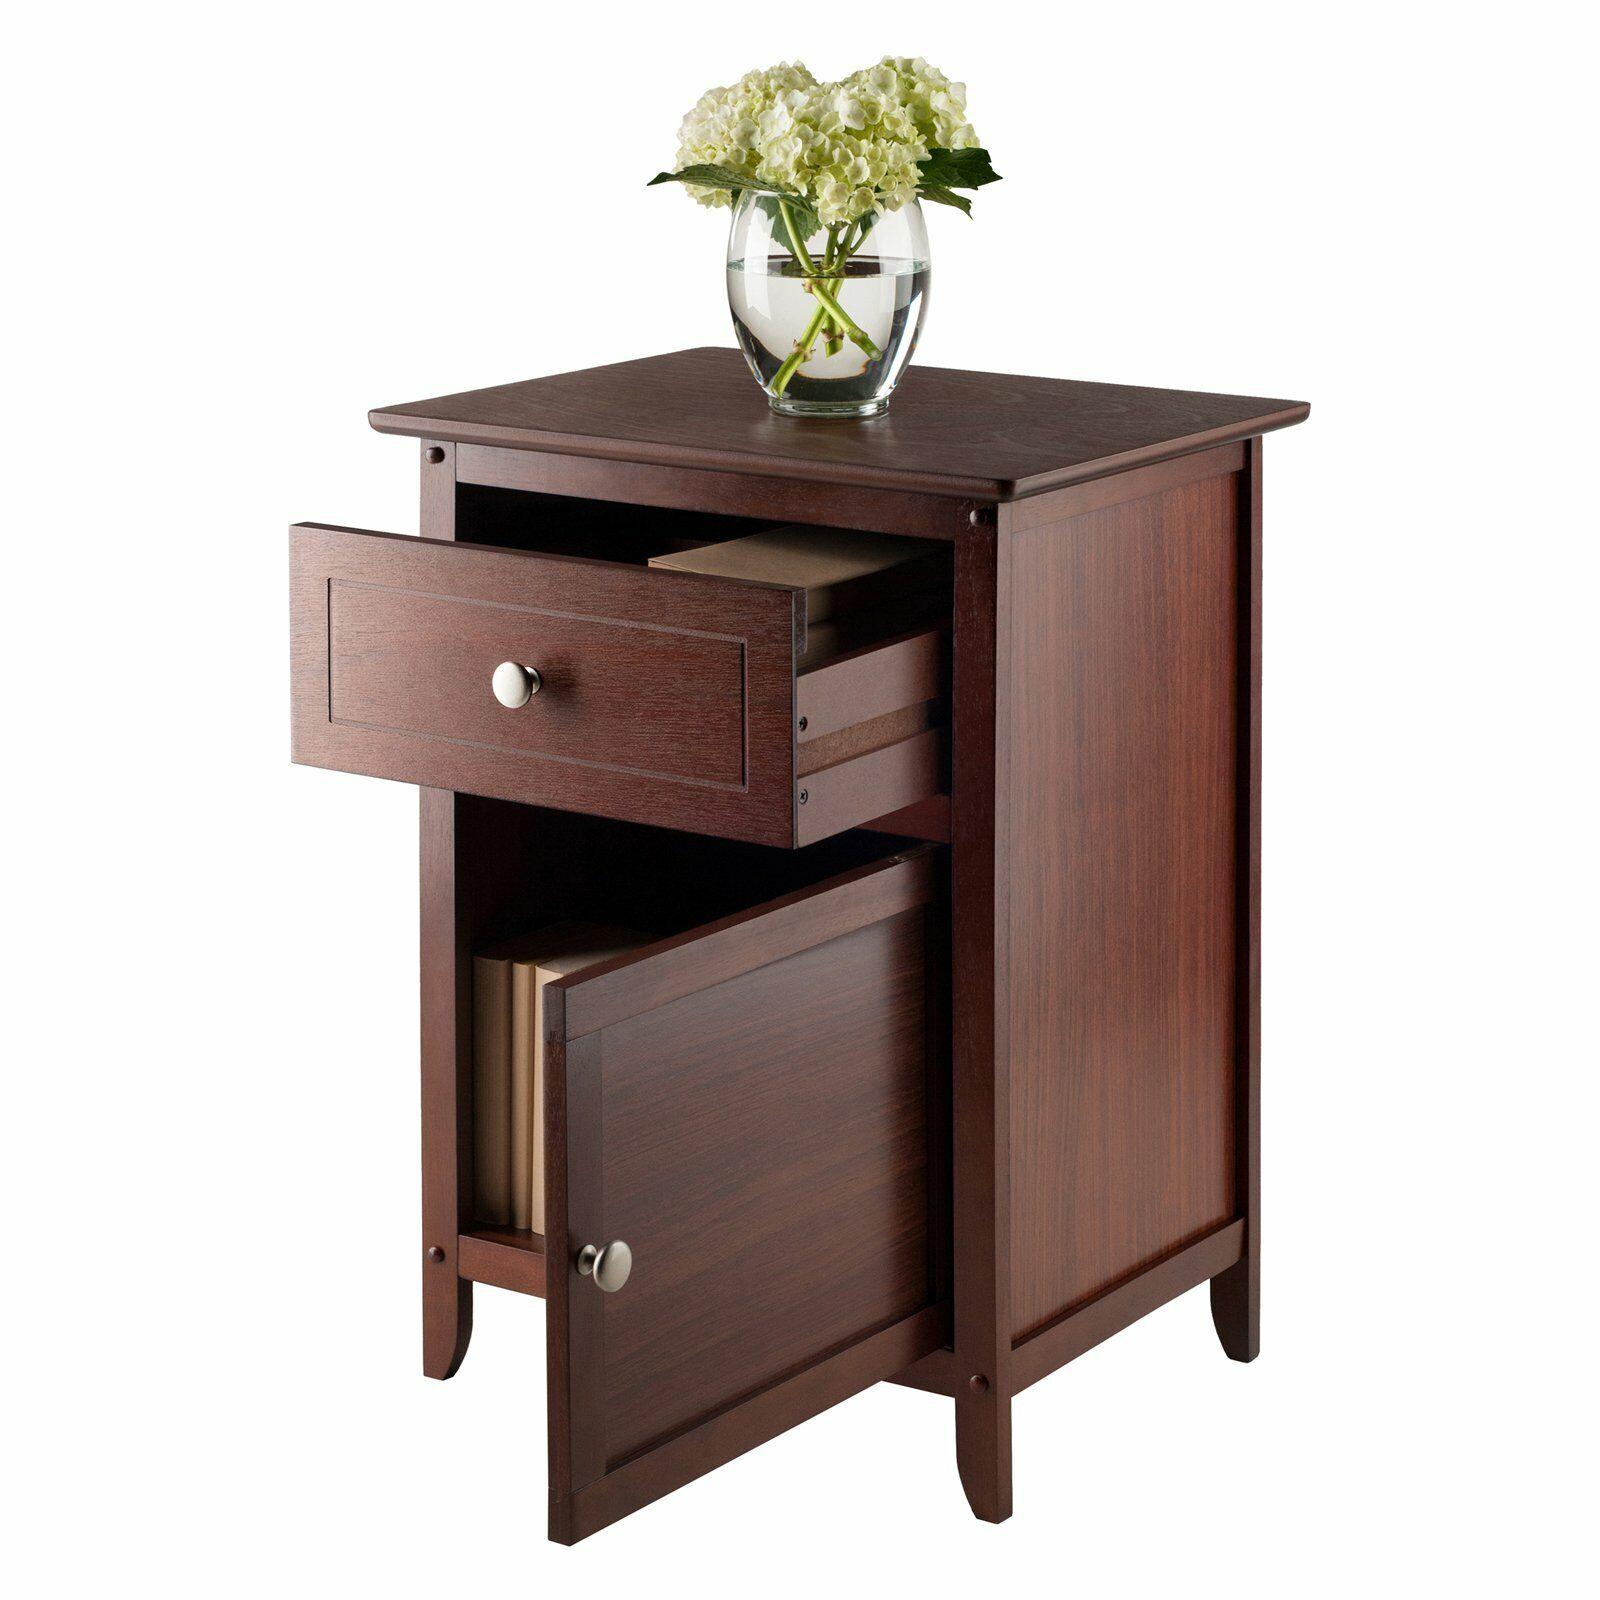 Benzara Syracuse Traditional Style Nightstand Dark Walnut For Sale Online Ebay